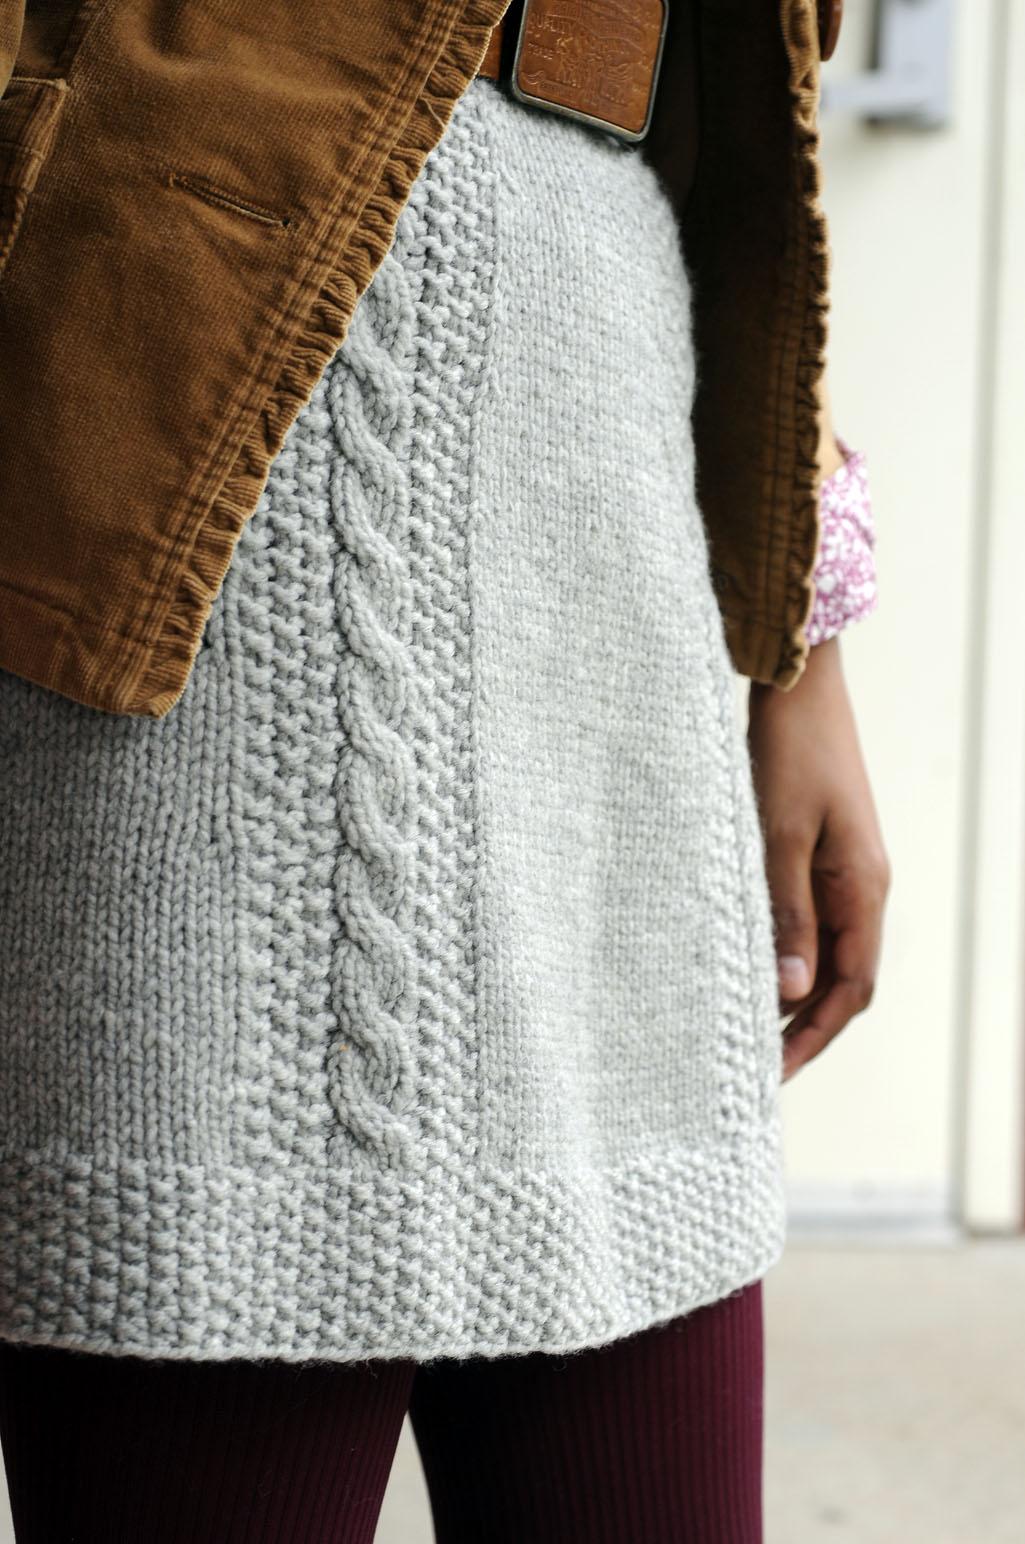 Free Skirt Knitting Patterns : Bryn Mawr Skirt - Interweave